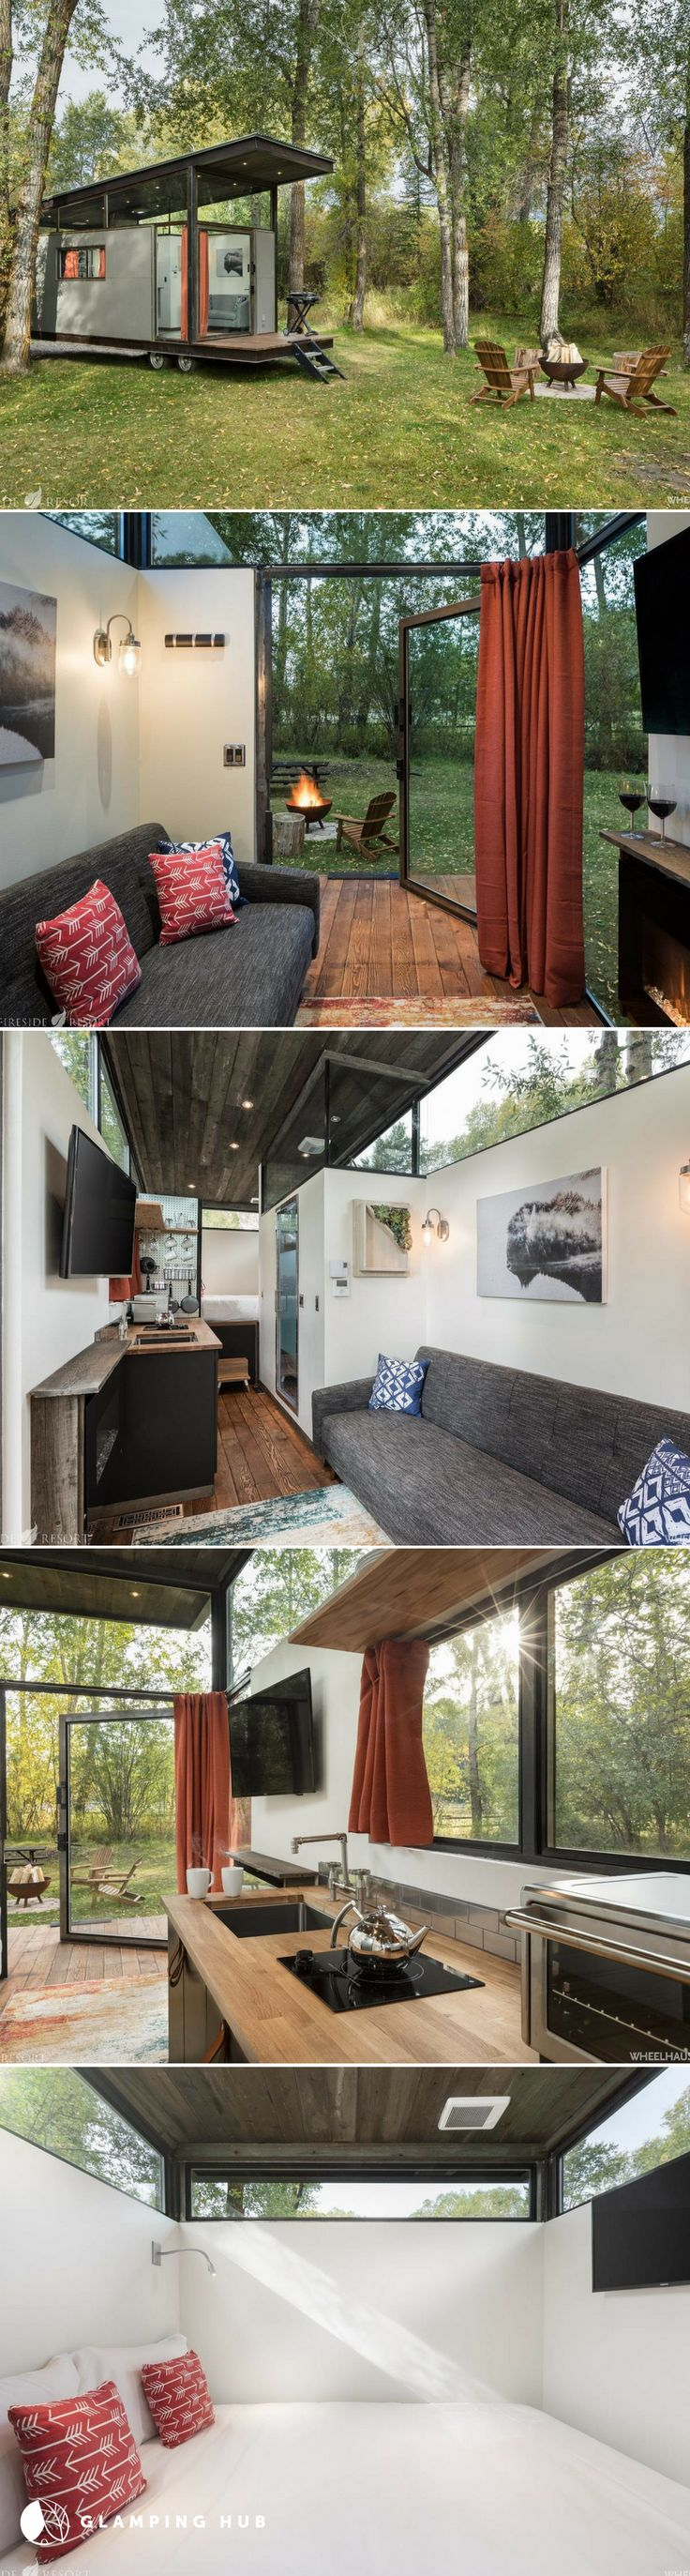 Best Tiny House Rentals Ideas On Pinterest Rental Homes Near - Couple takes tiny house big adventure